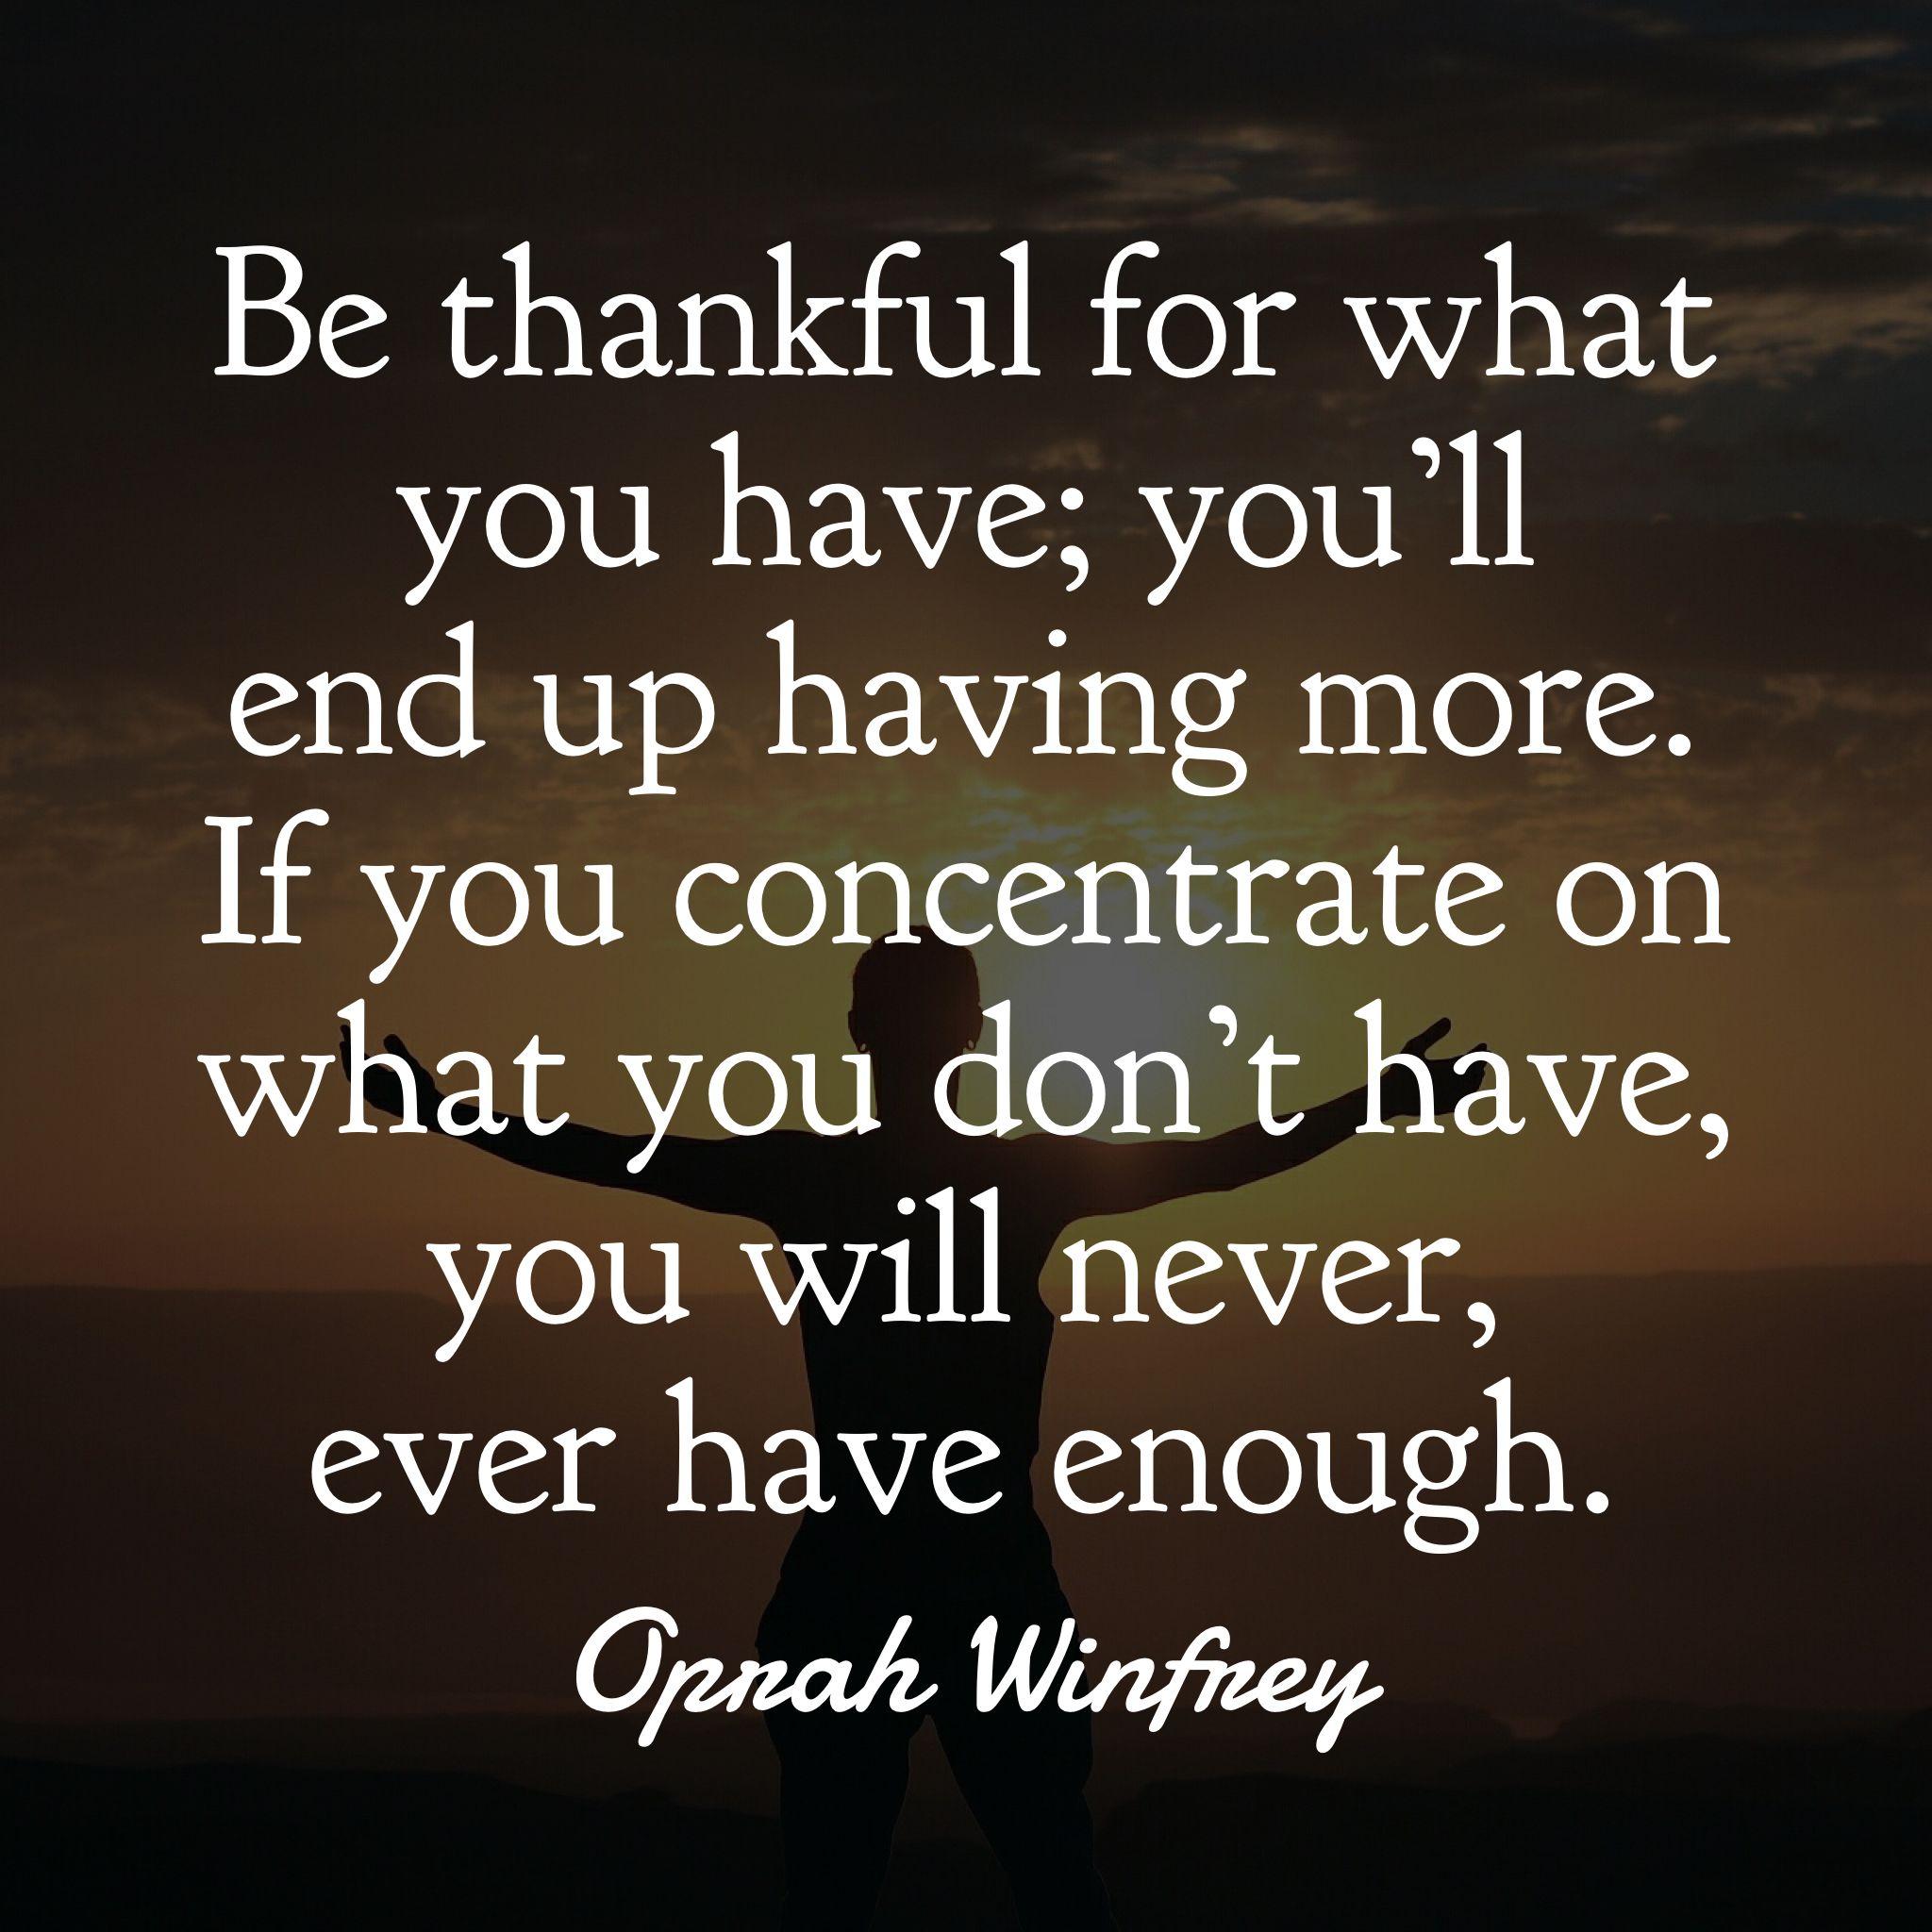 25 Empowering Oprah Winfrey Quotes